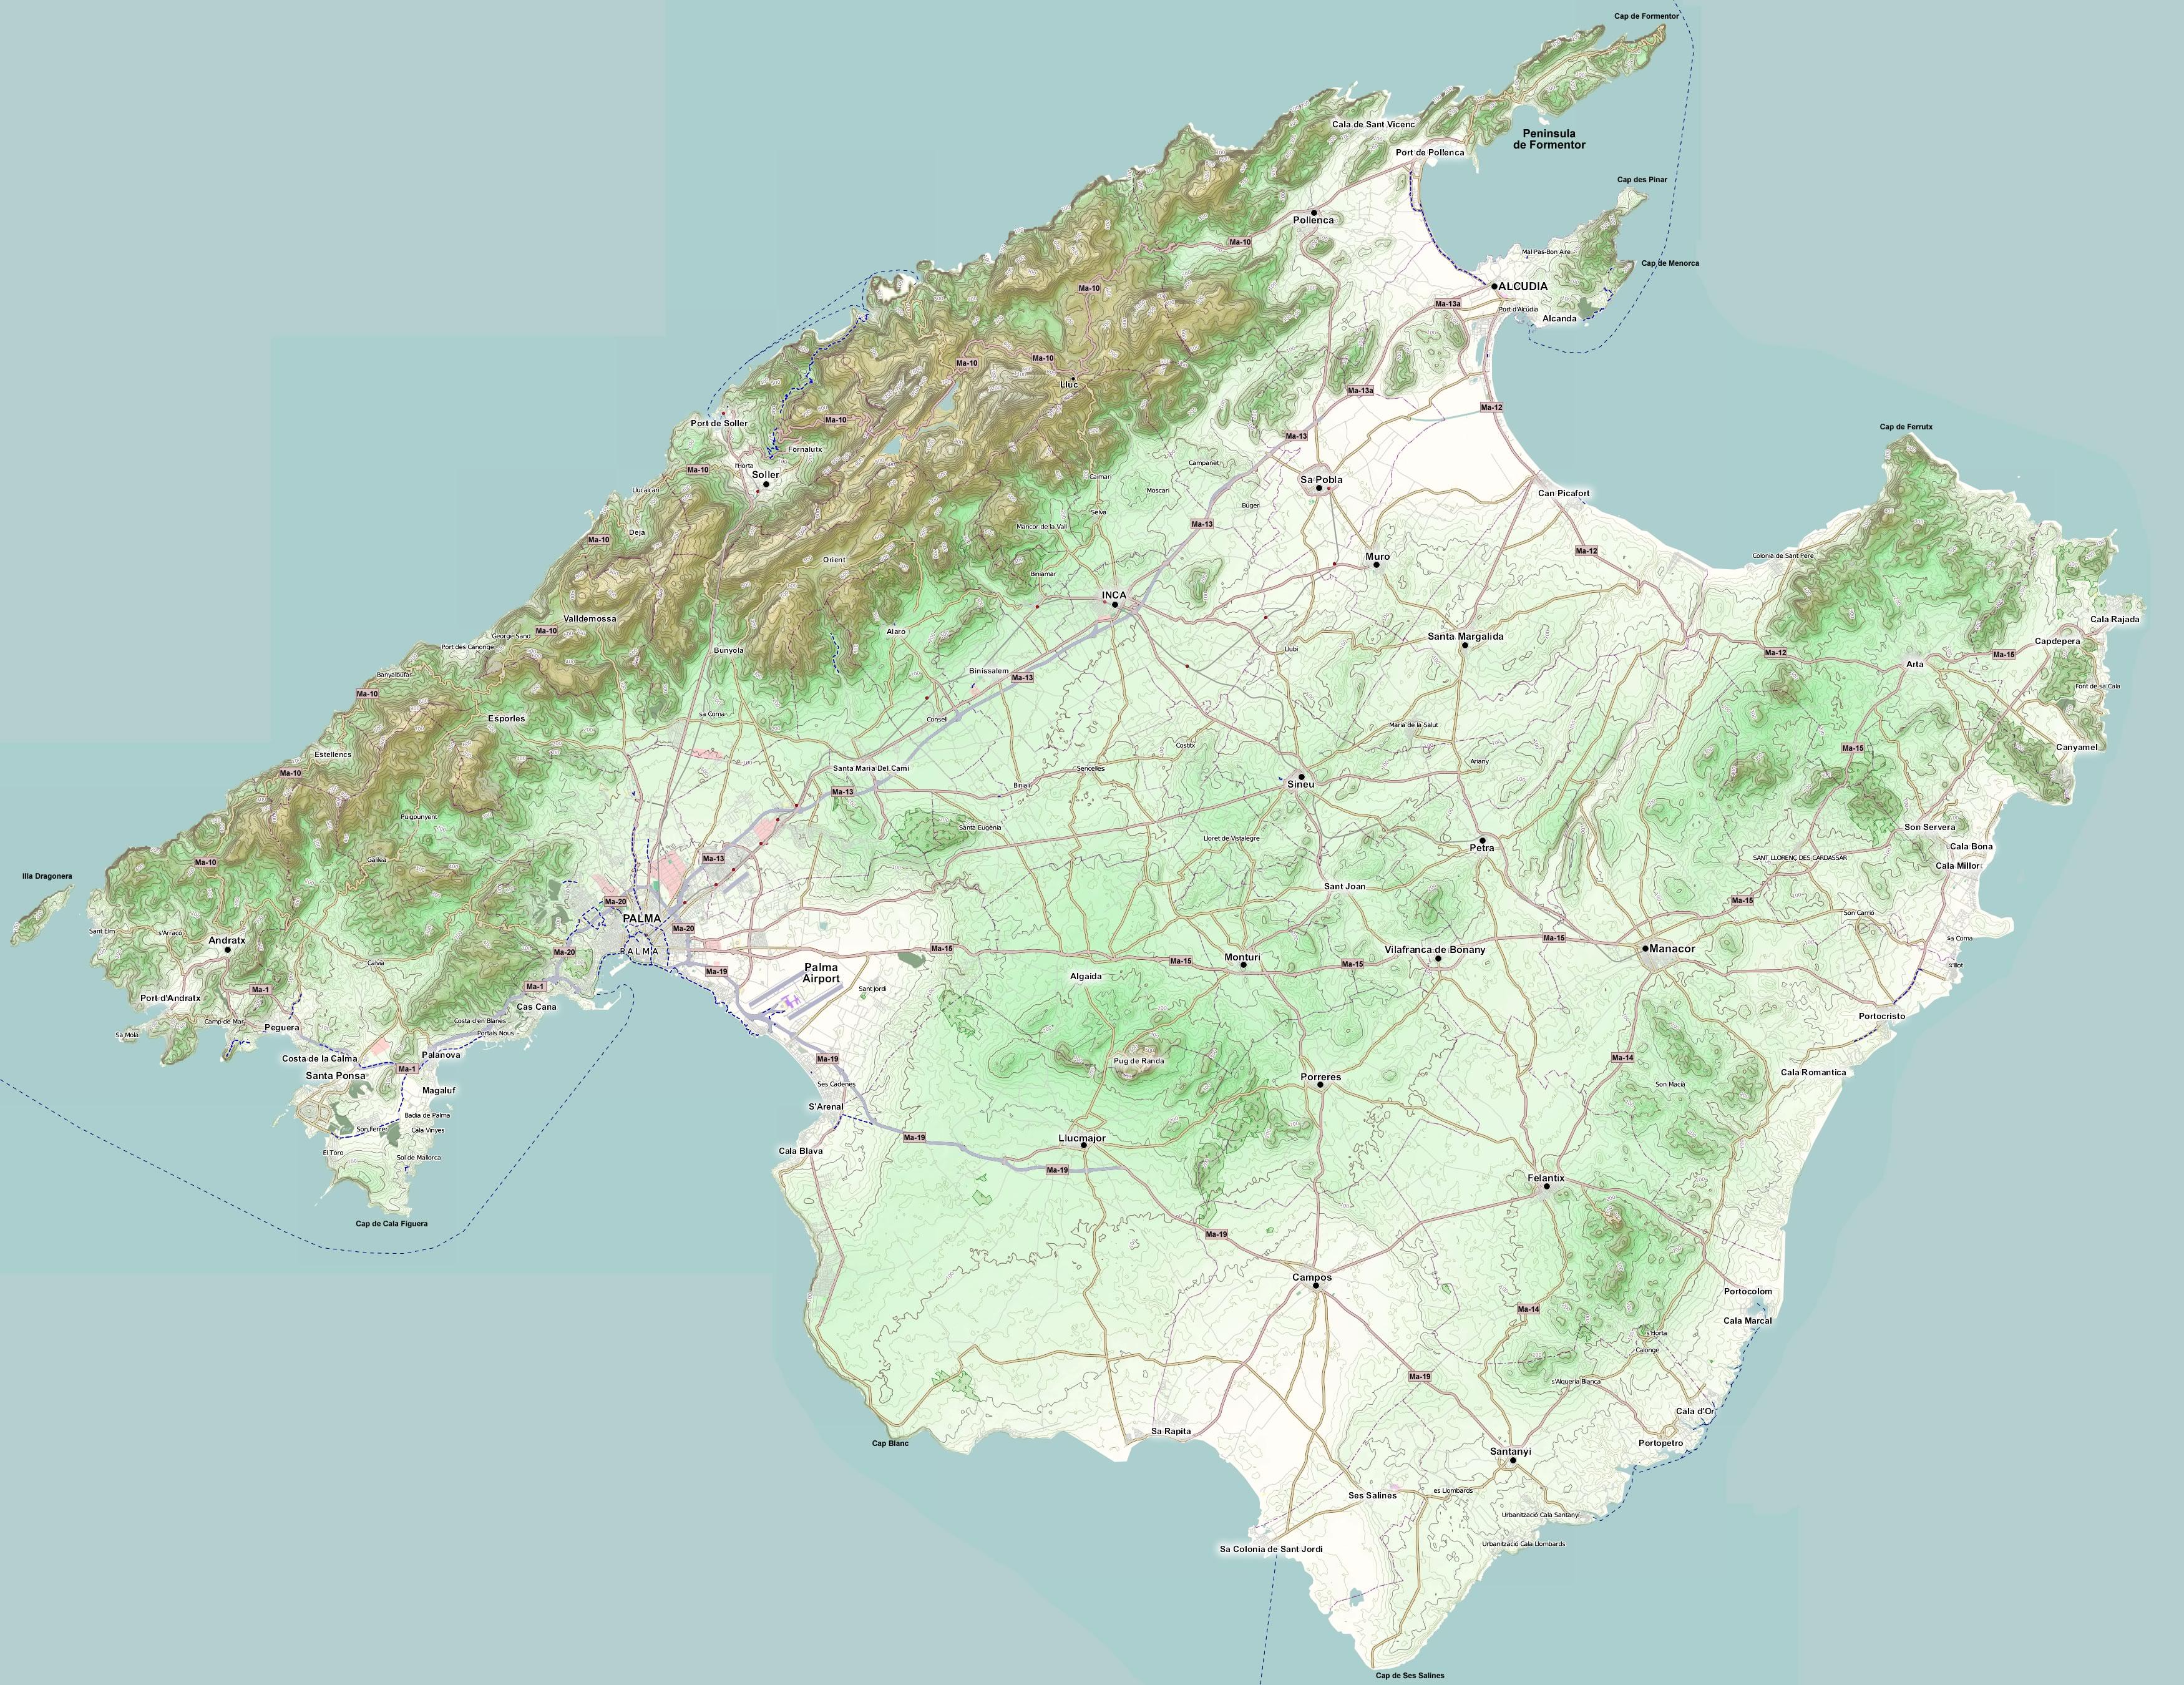 Majorca Offline Map including Palma Magaluf Palmanova Alcudia